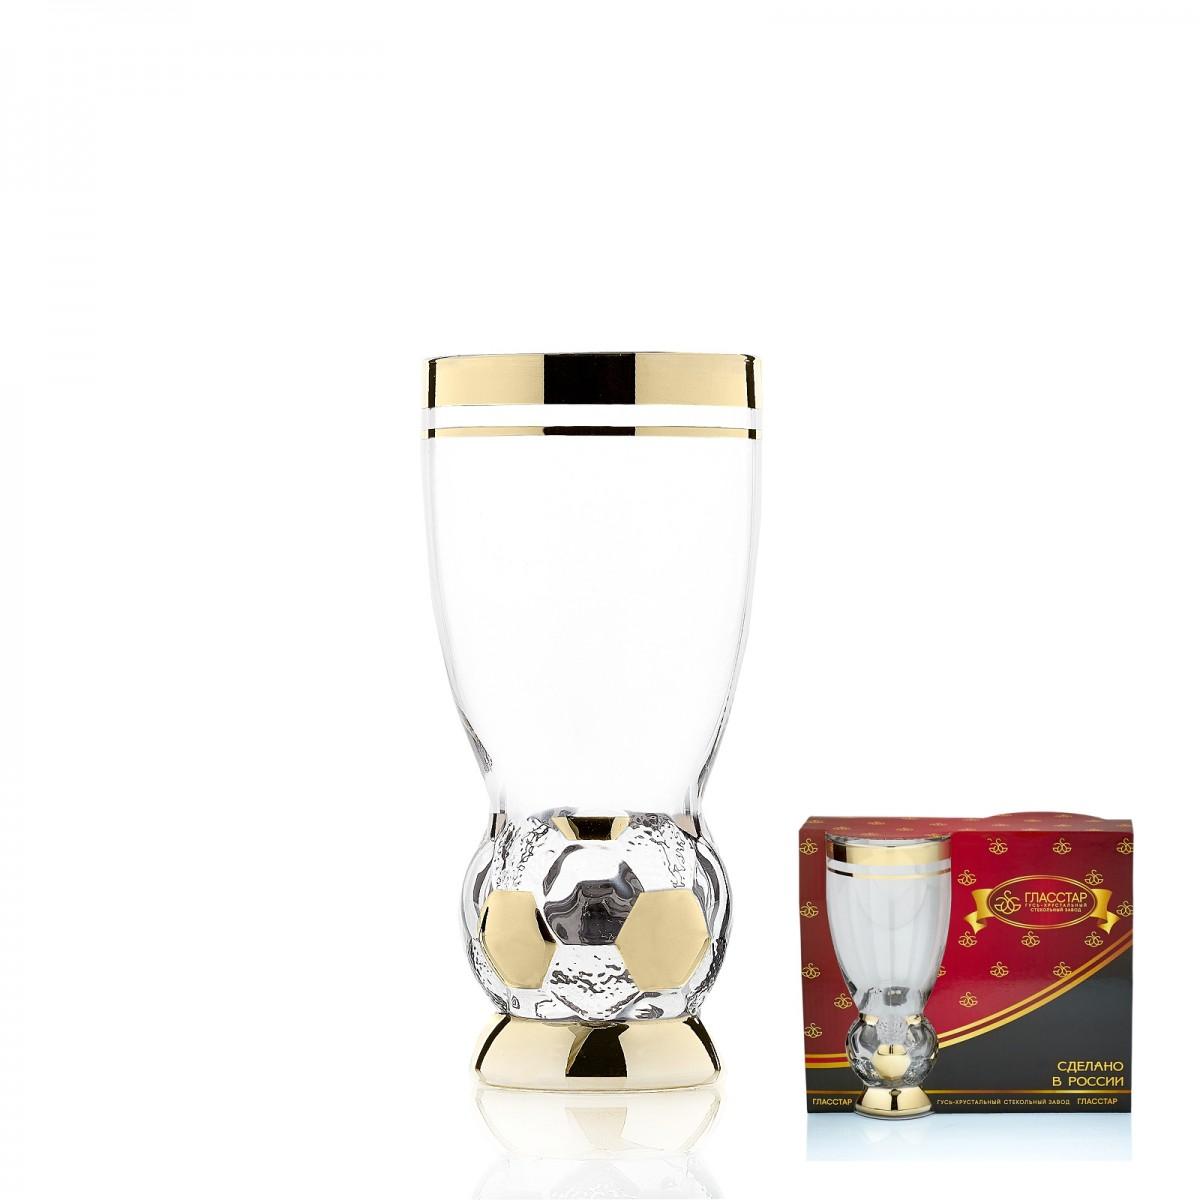 N_4052(2)_1 Набор из 2 стаканов, 410 мл «Кубок победителя»